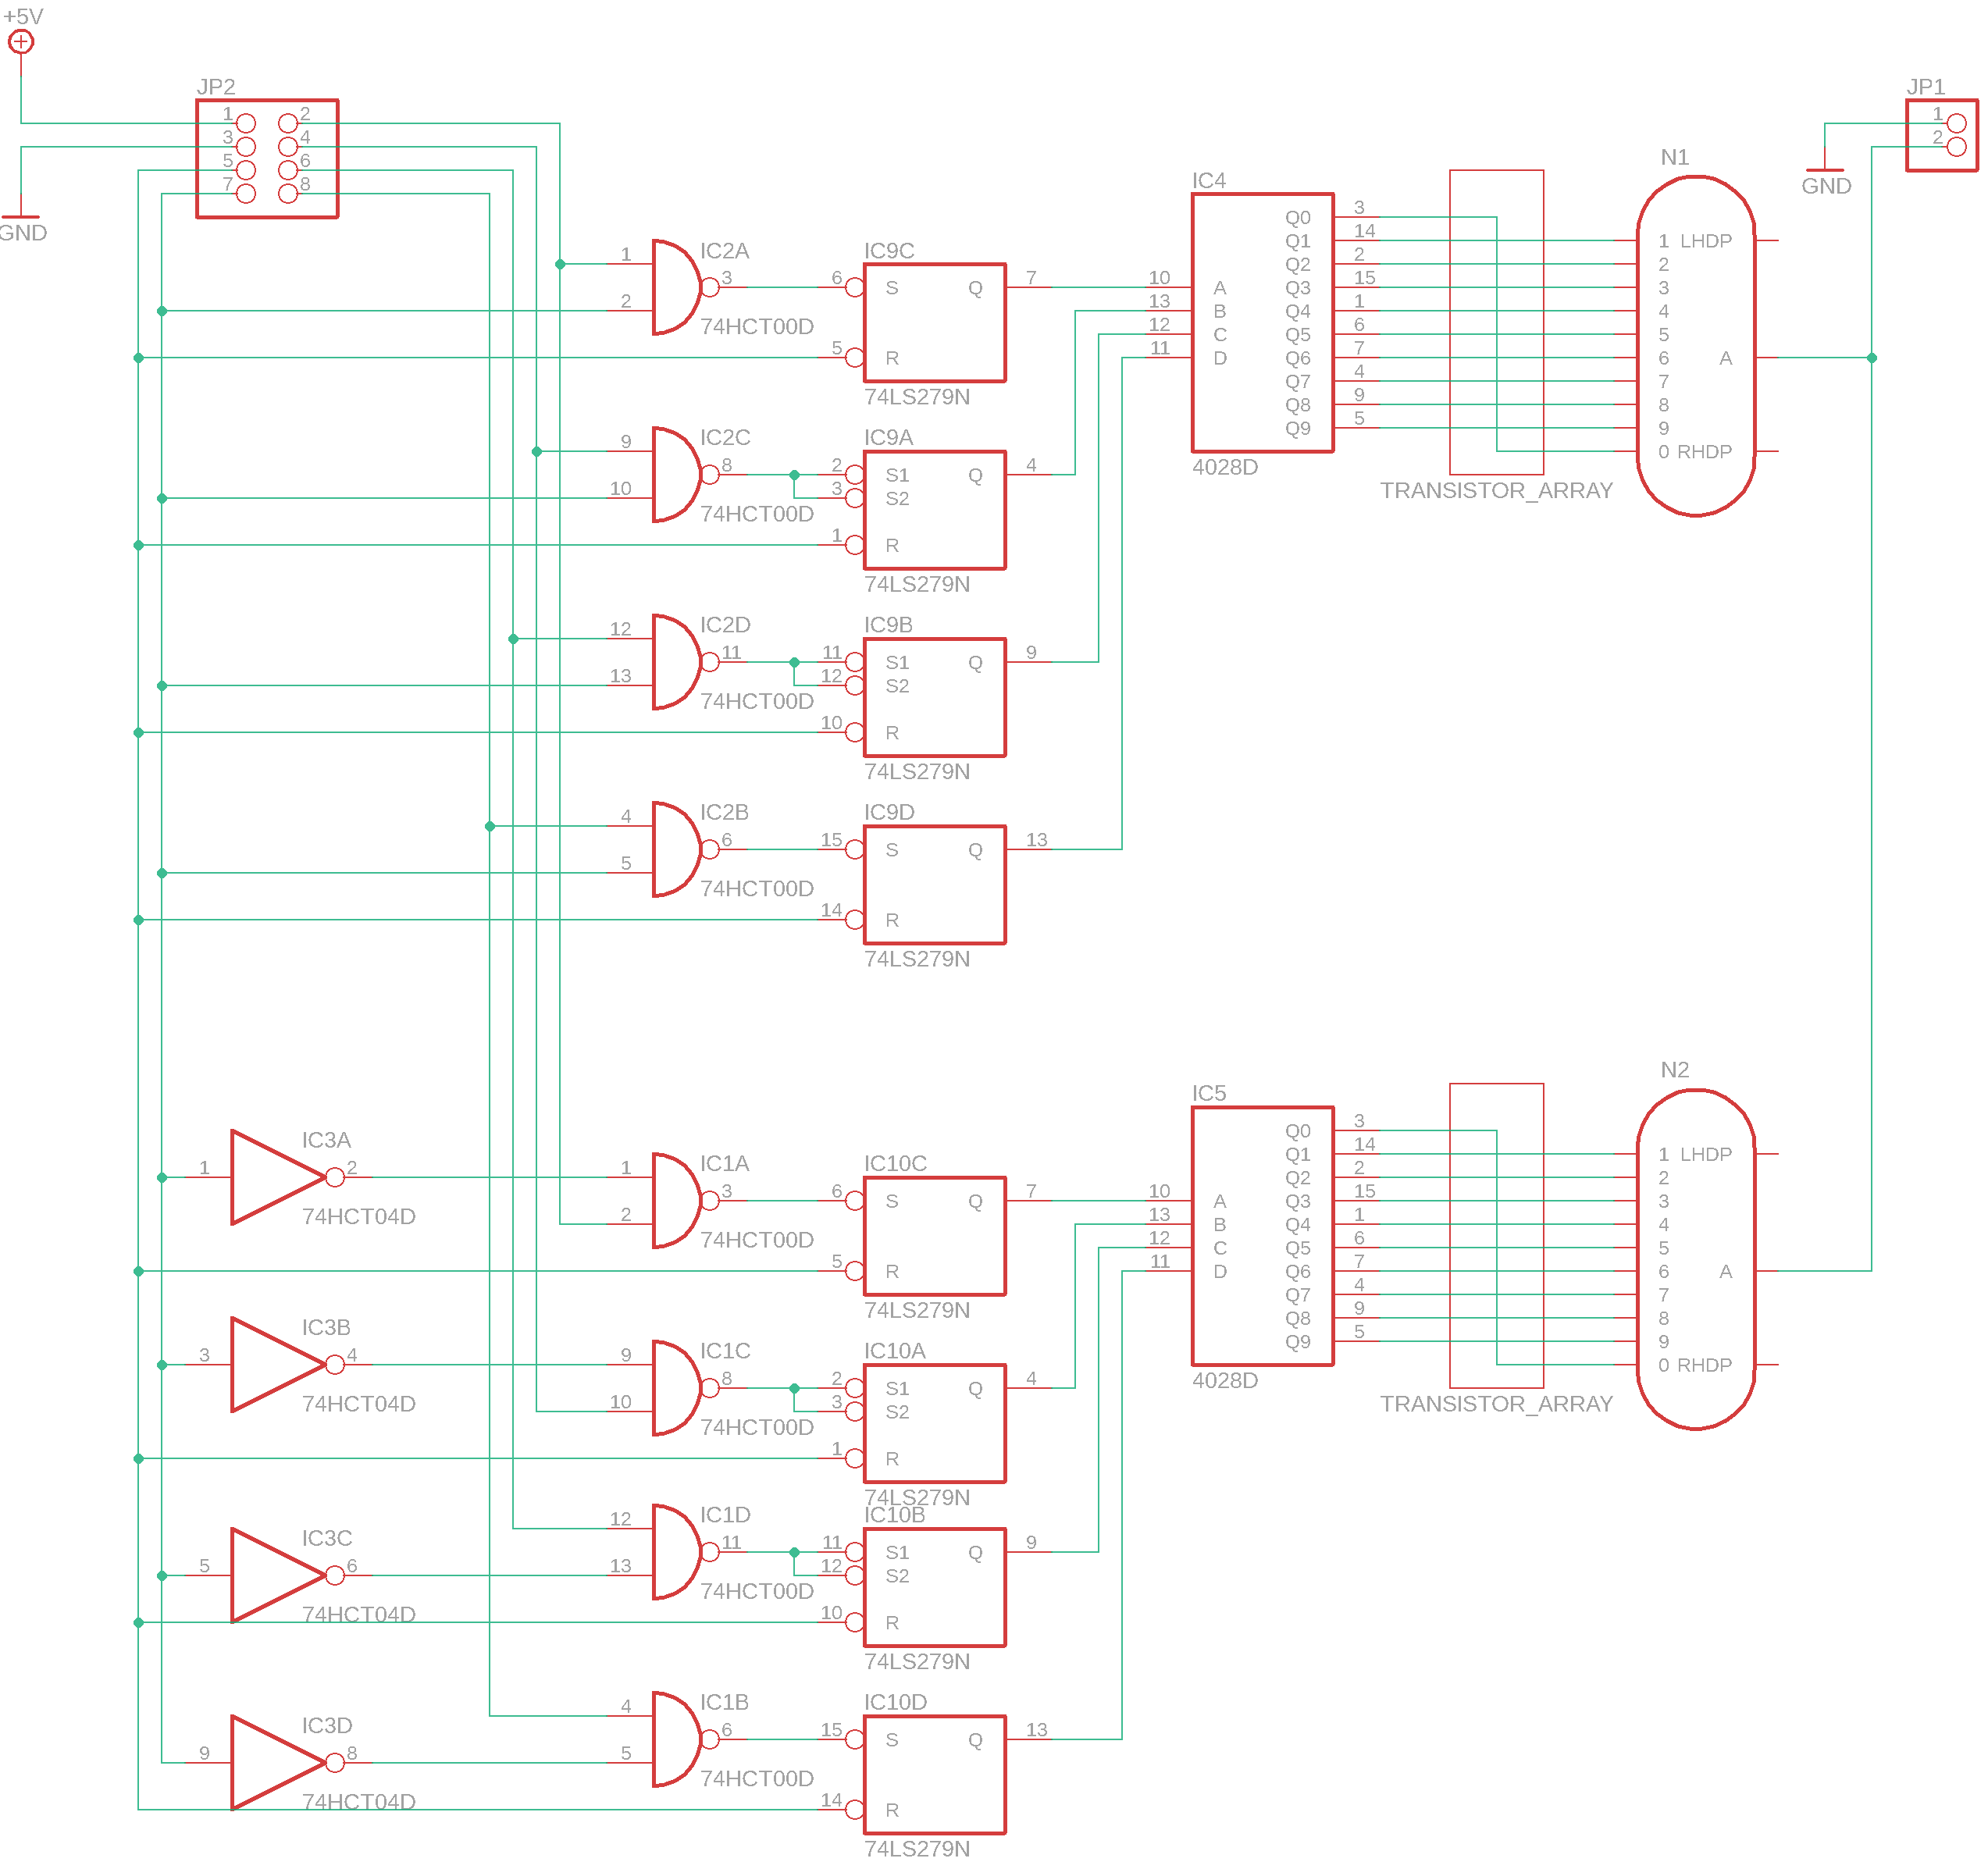 Wiring Diagram Additionally In 1 Nixie Tube On Nixie Tube Tester